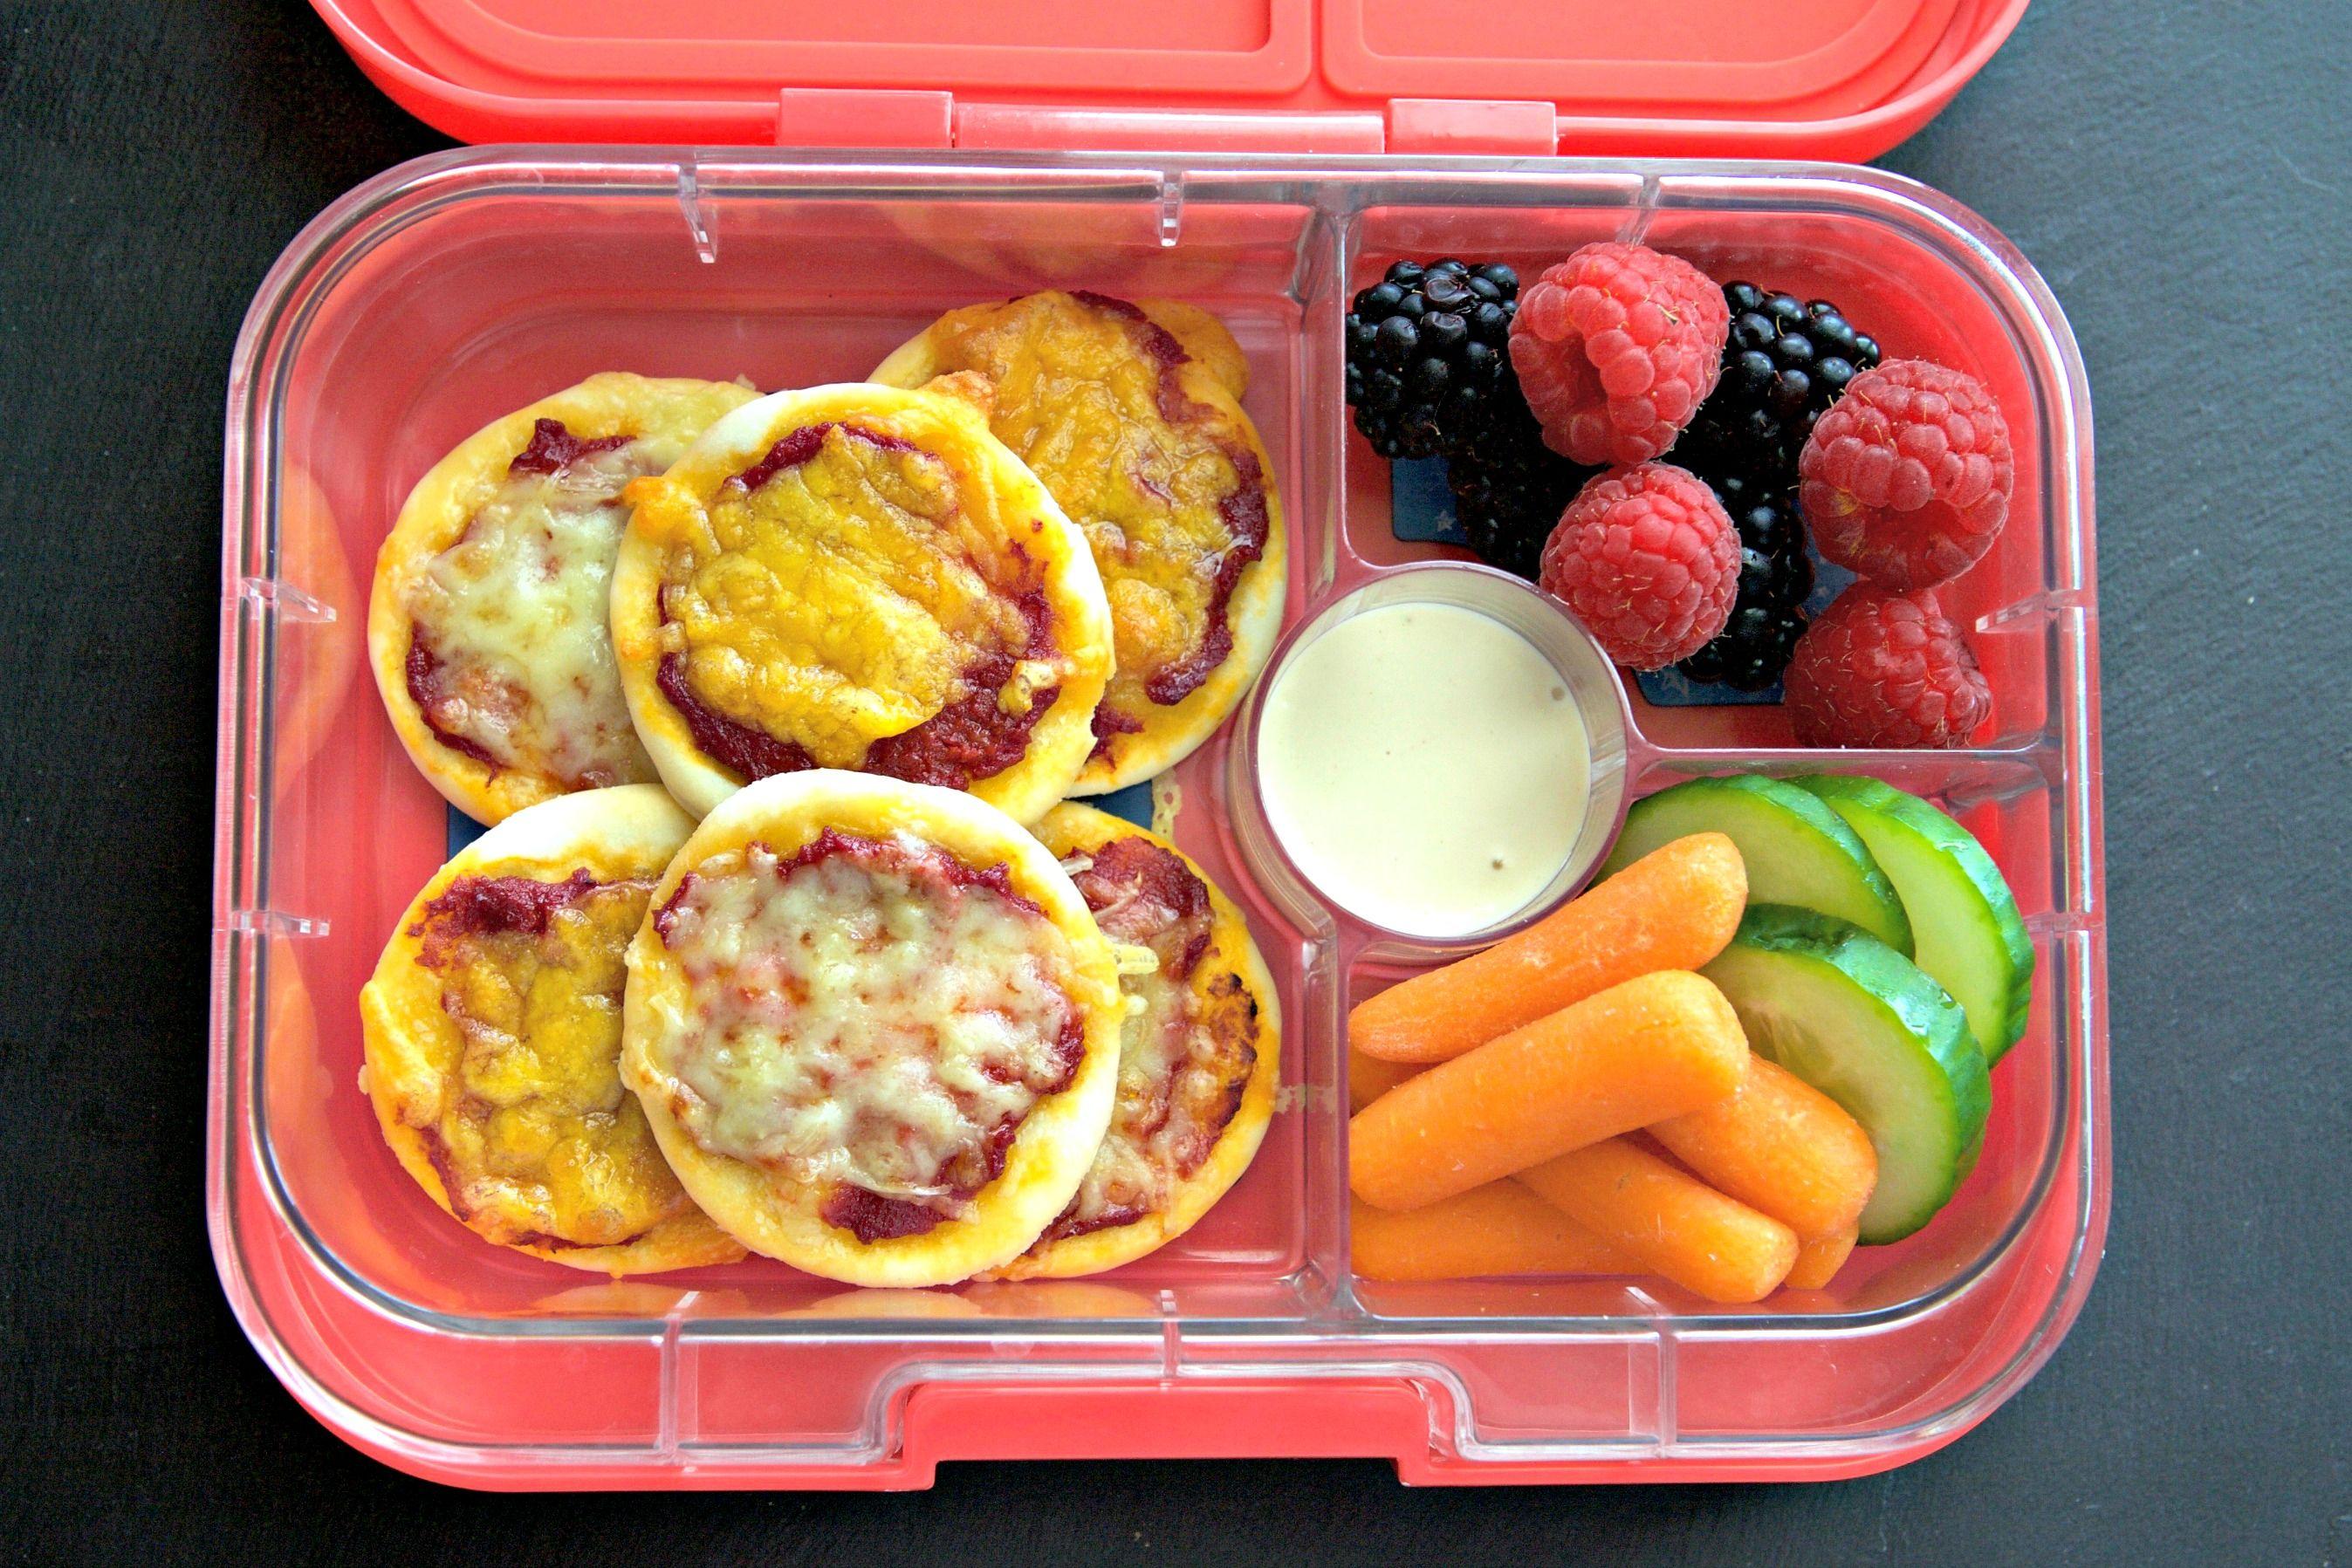 hot box for food rental